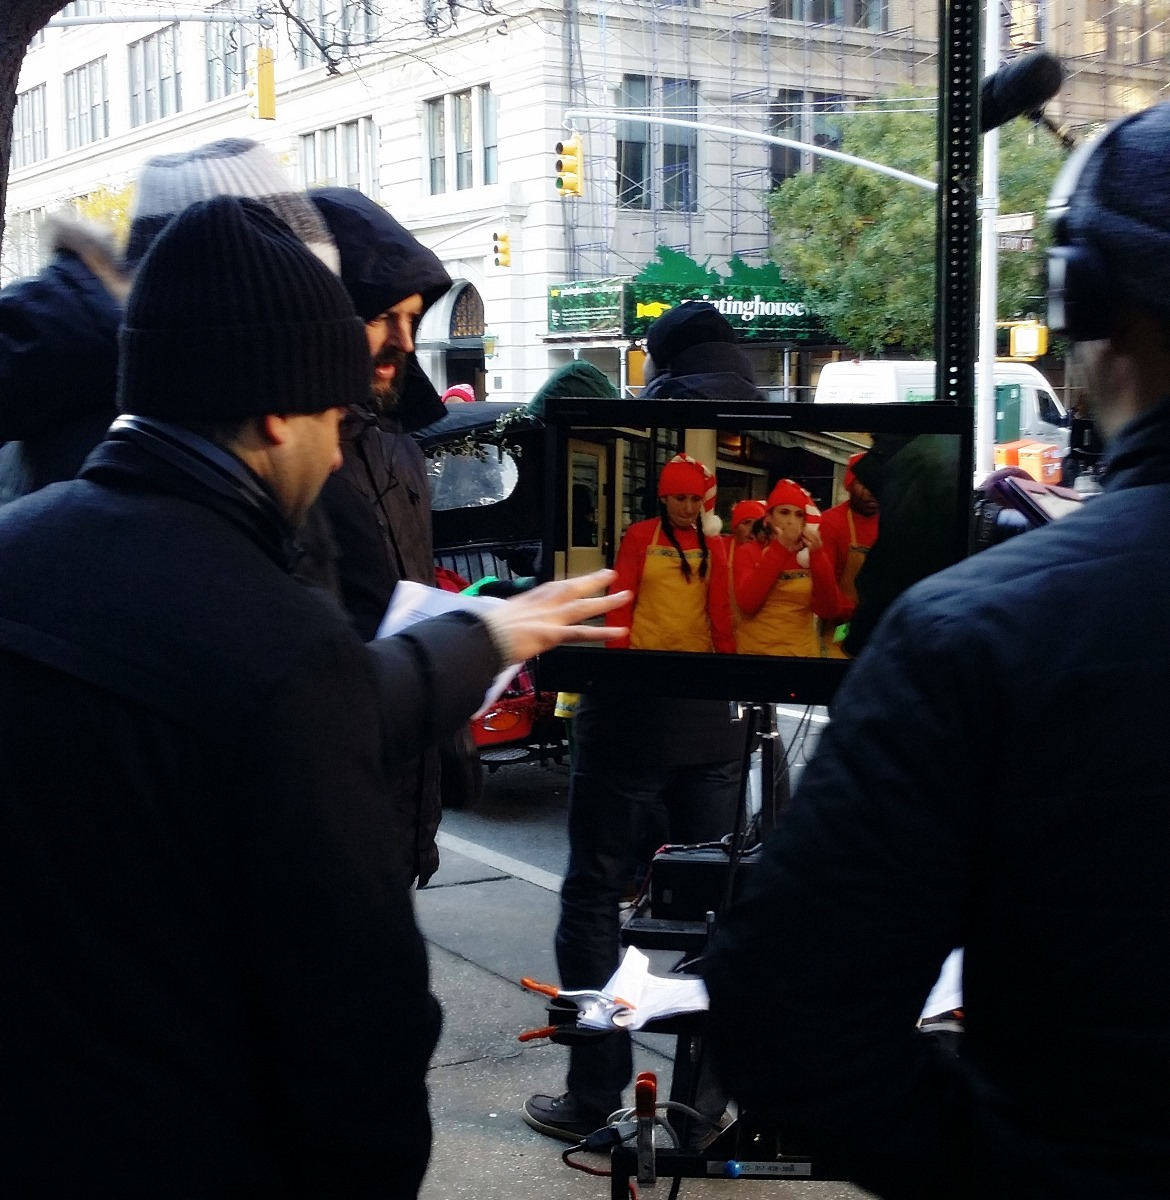 Filming Christmas ads - New York New York, travel blog by BeckyBecky Blogs